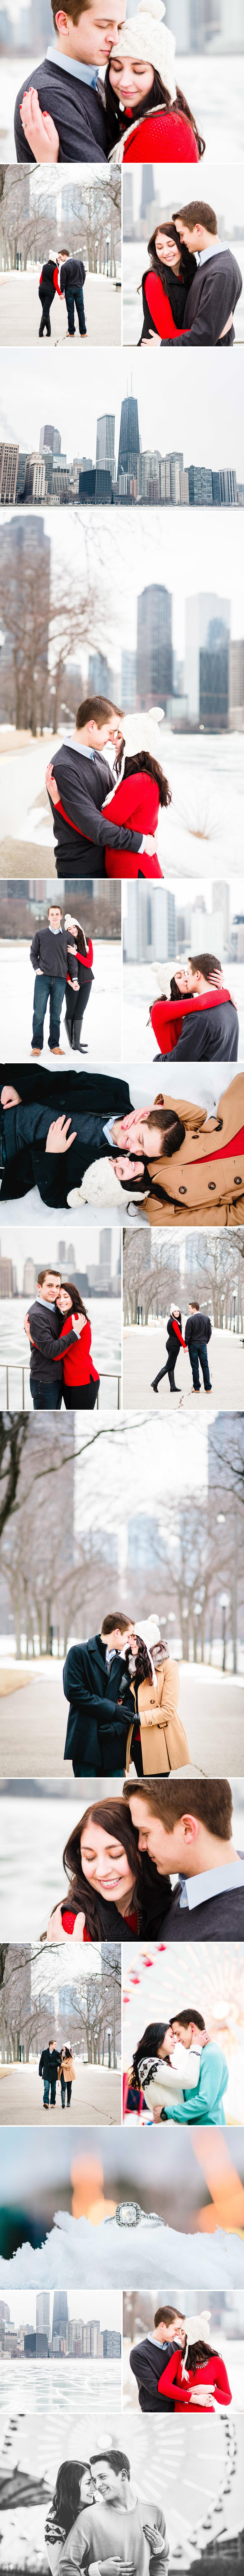 chicago-fine-art-wedding-photography-ar